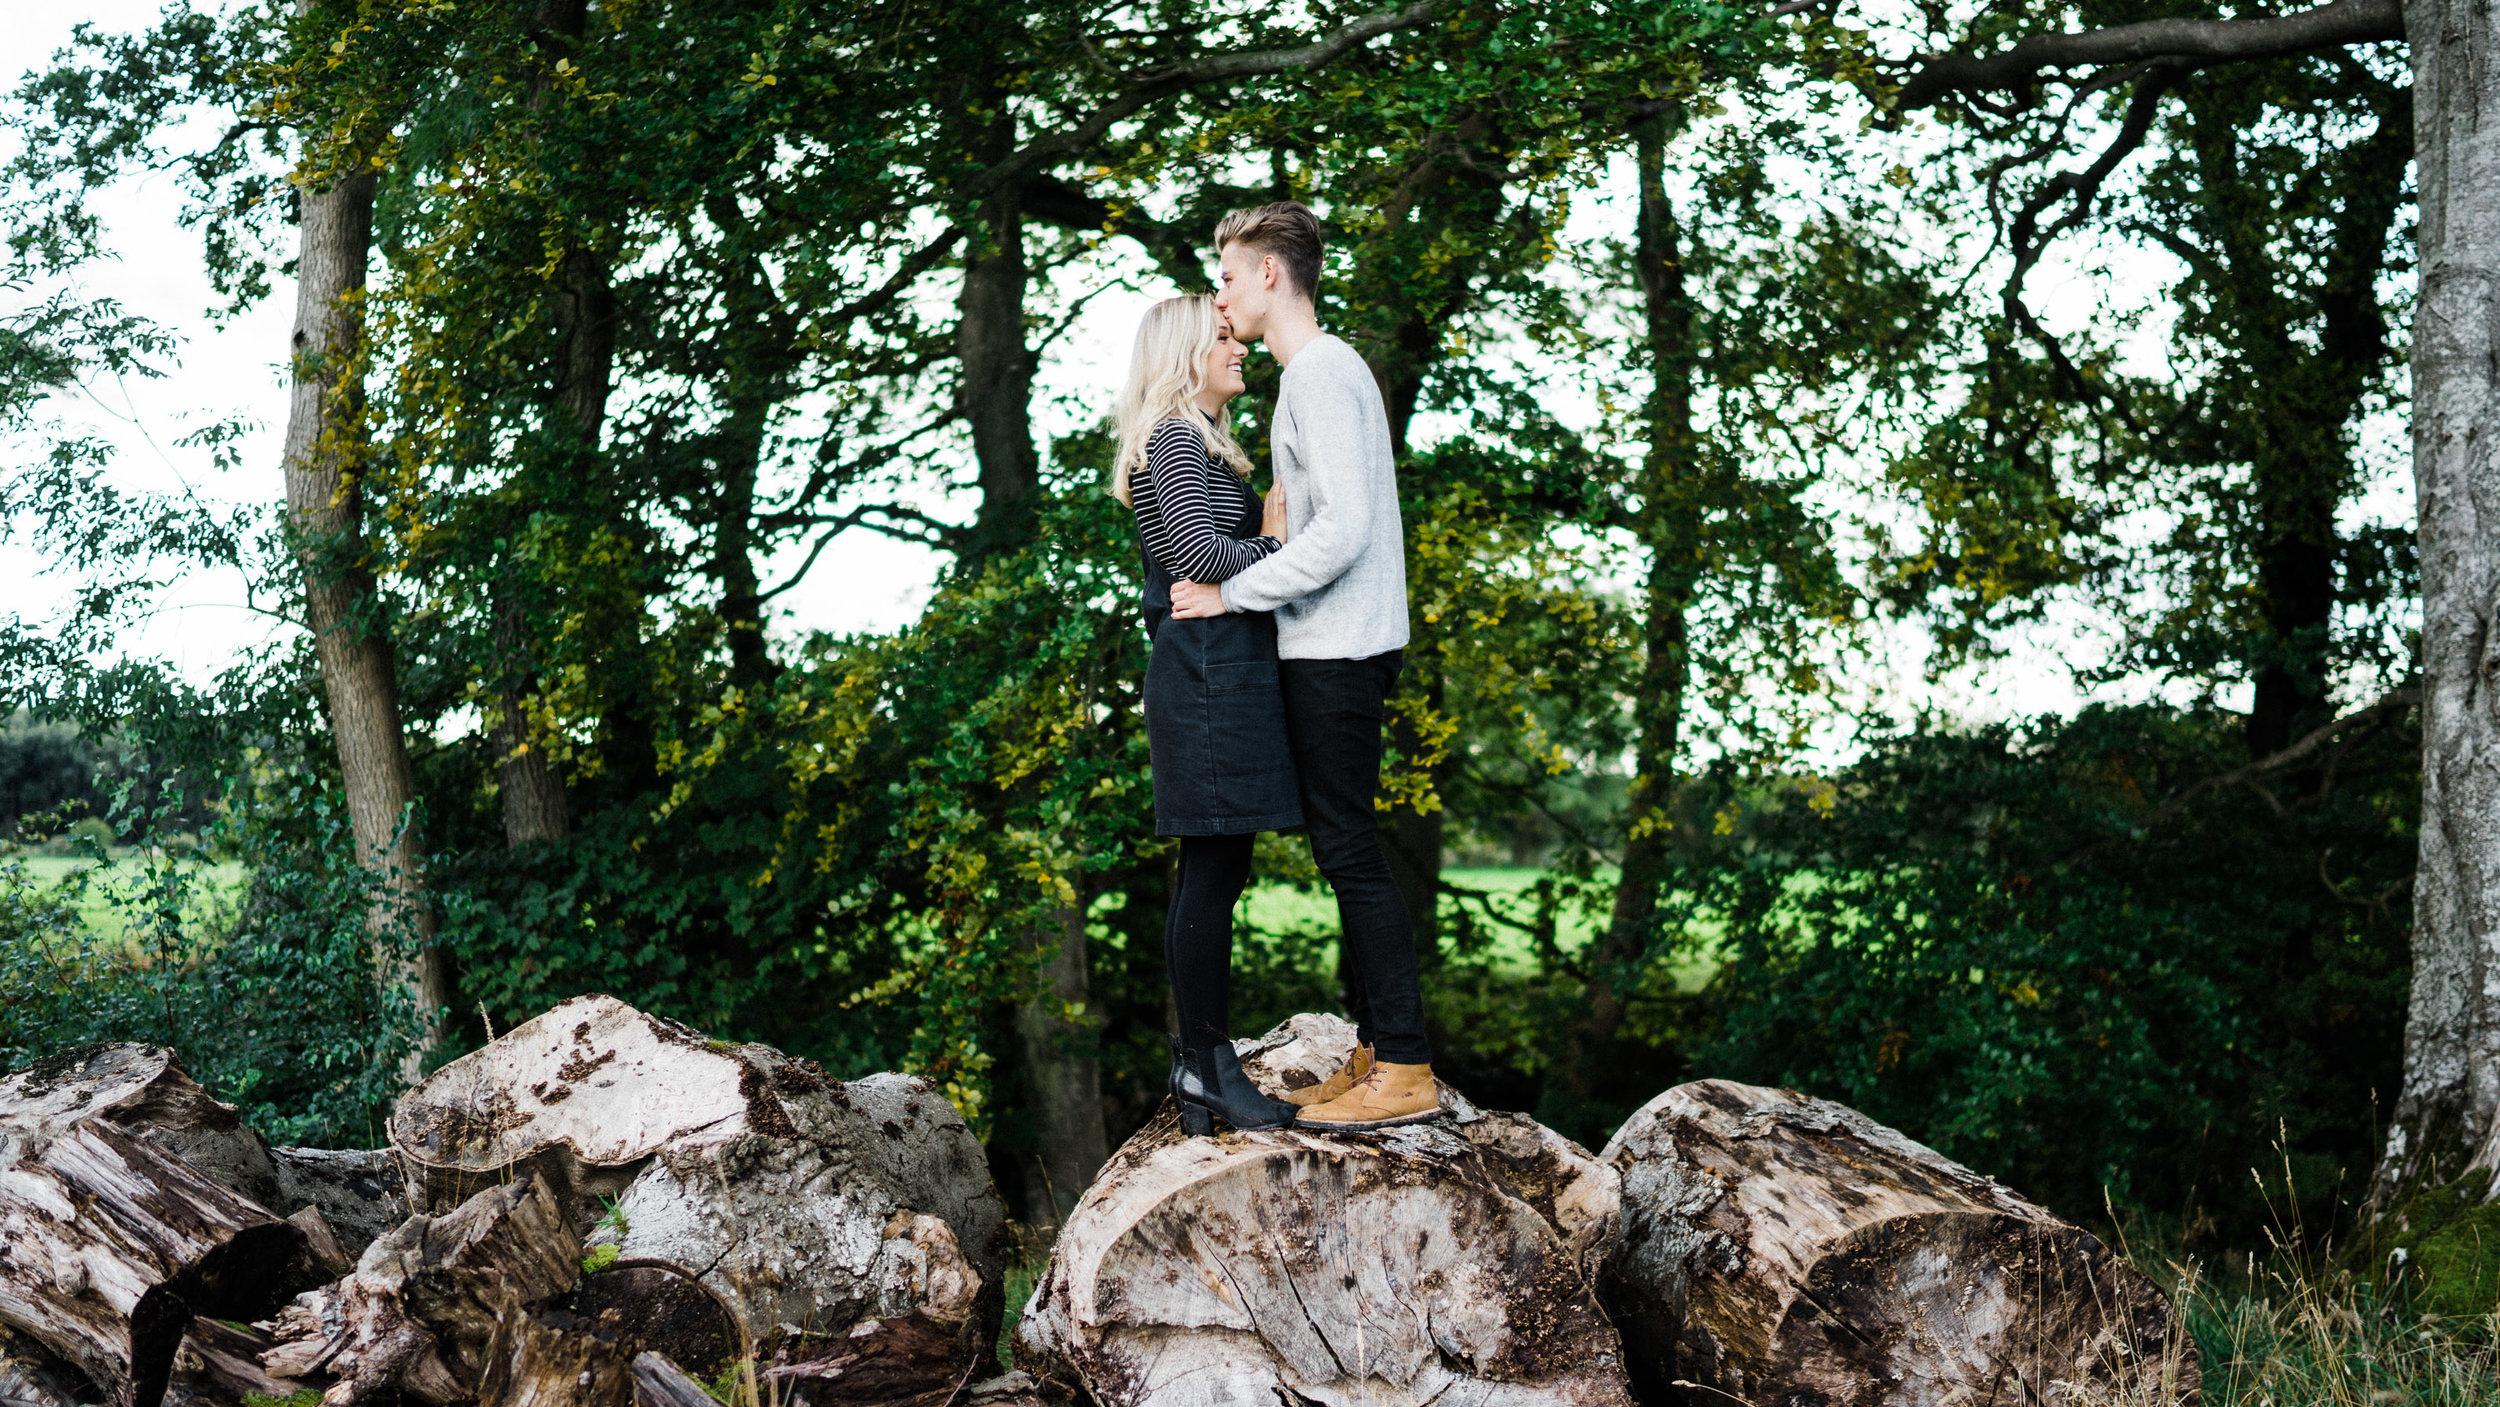 www.bytomw.com - Tom Wright - Manchester & Lake District Wedding Photographer -01084.jpg